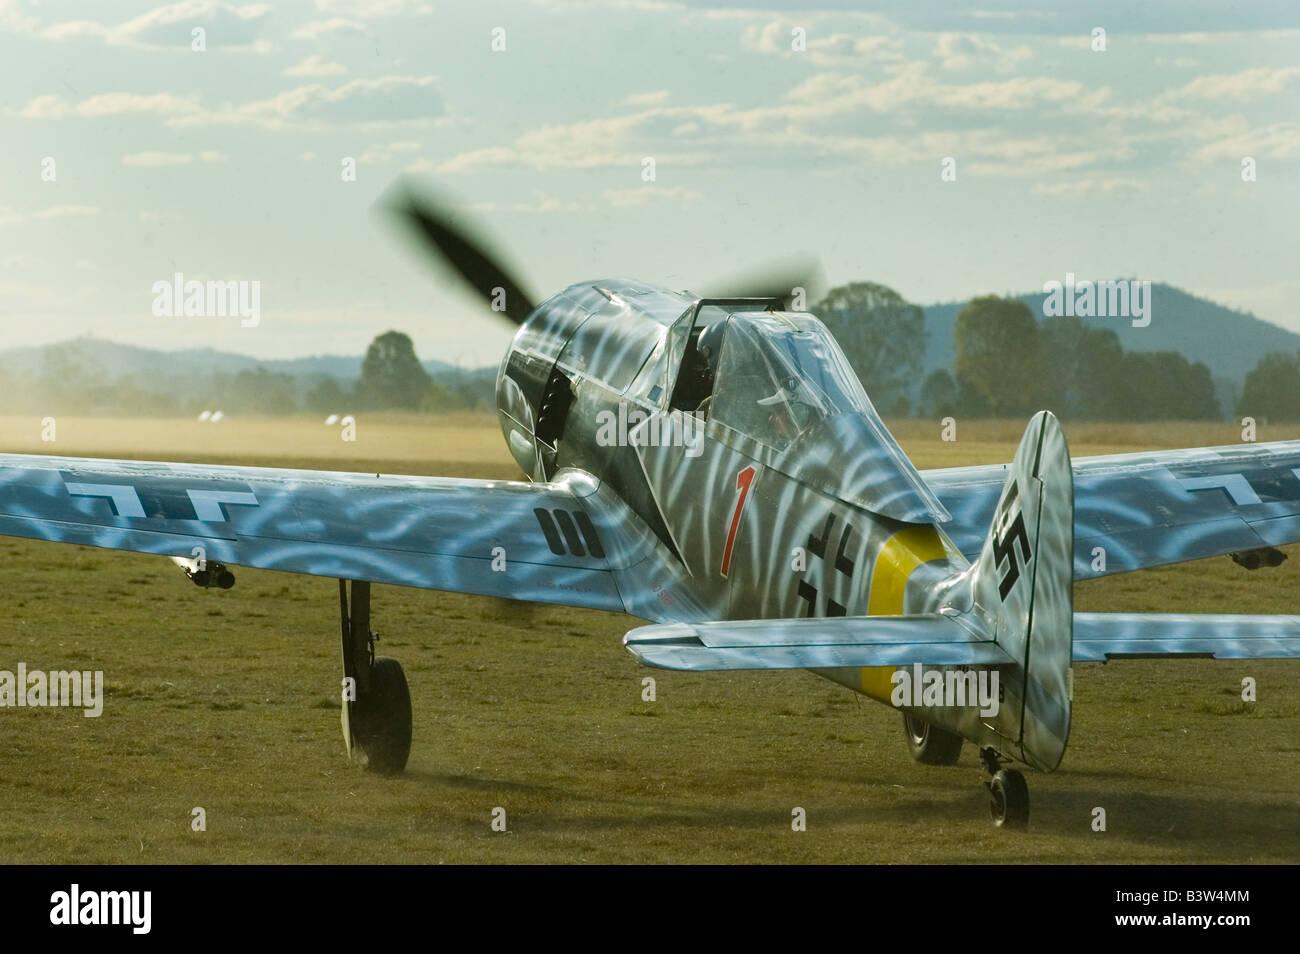 FW 190 Luftwaffe Focke Wulf Wolf 1/2 scale replica - Stock Image